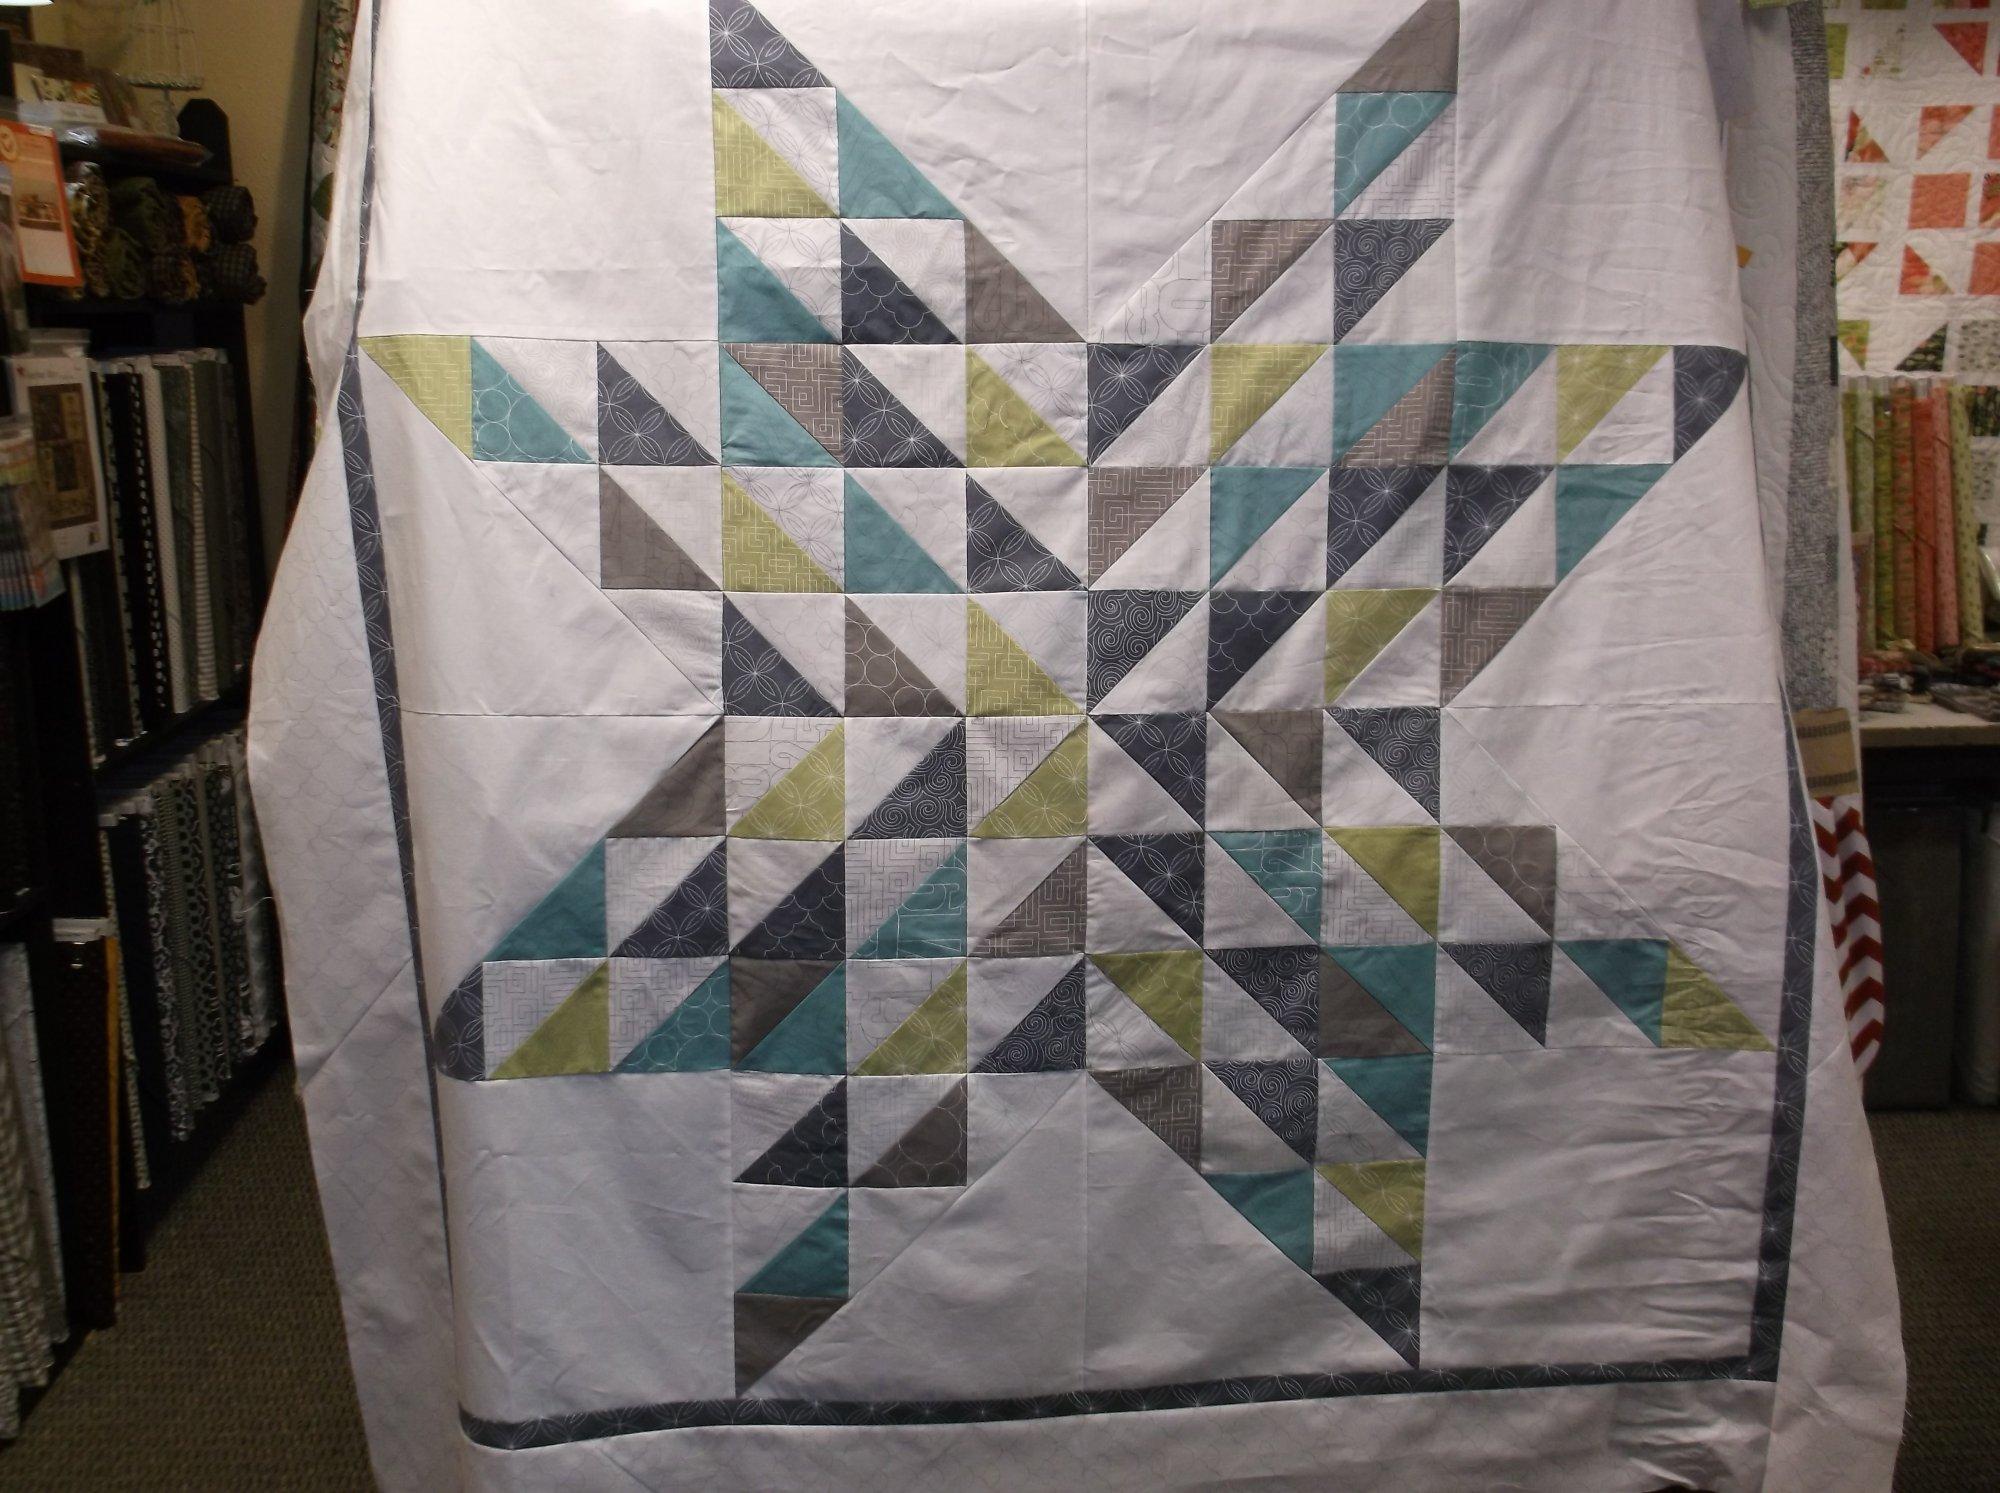 Thrive Barn Star quilt kit